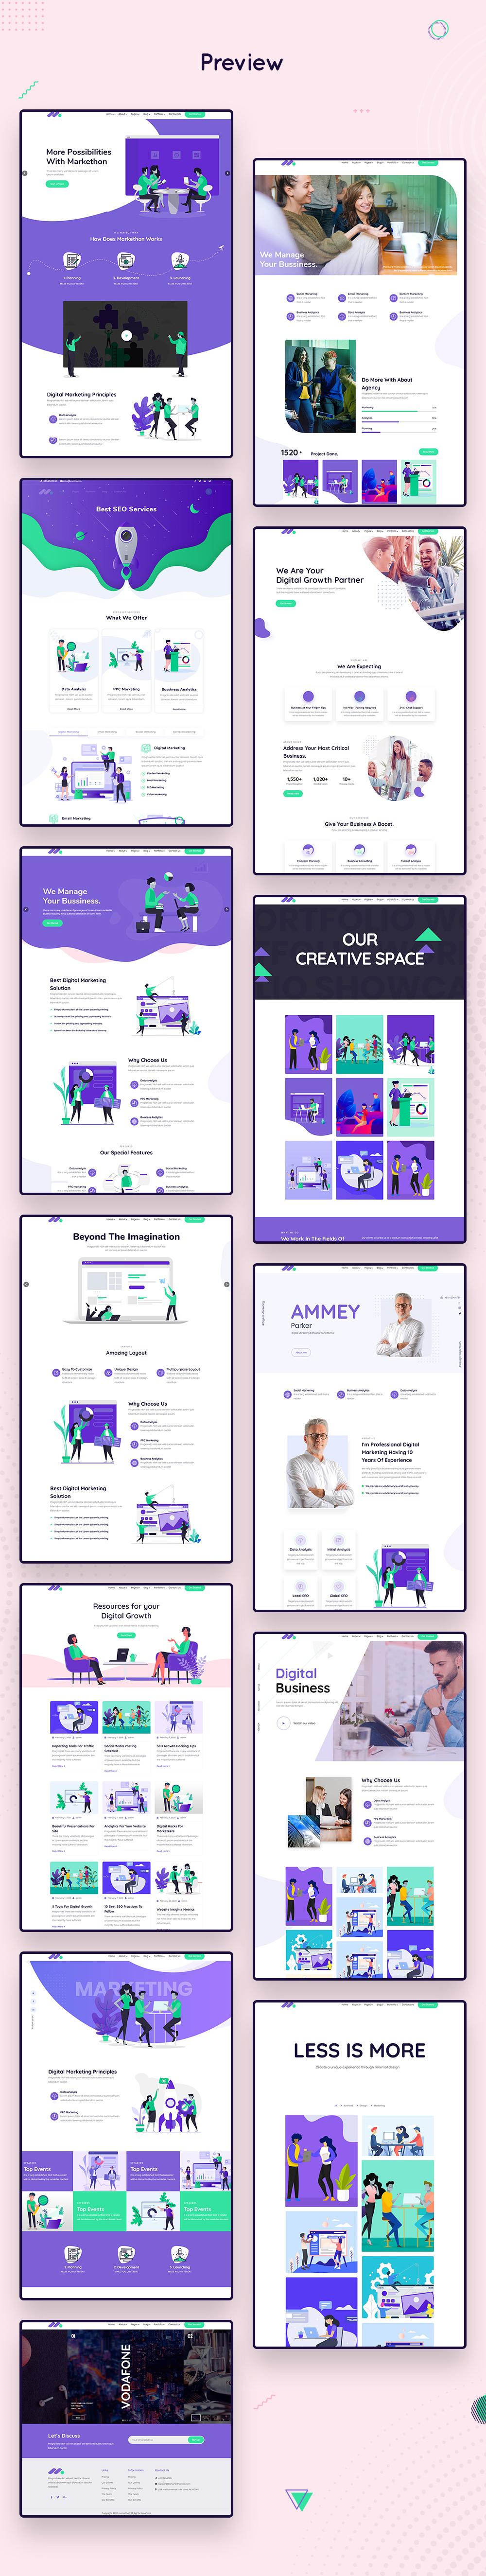 Markethon - SEO & Digital Marketing Agency Portfolio WordPress Theme - 7 seo and digital marketing agency portfolio wordpress theme Markethon part 3